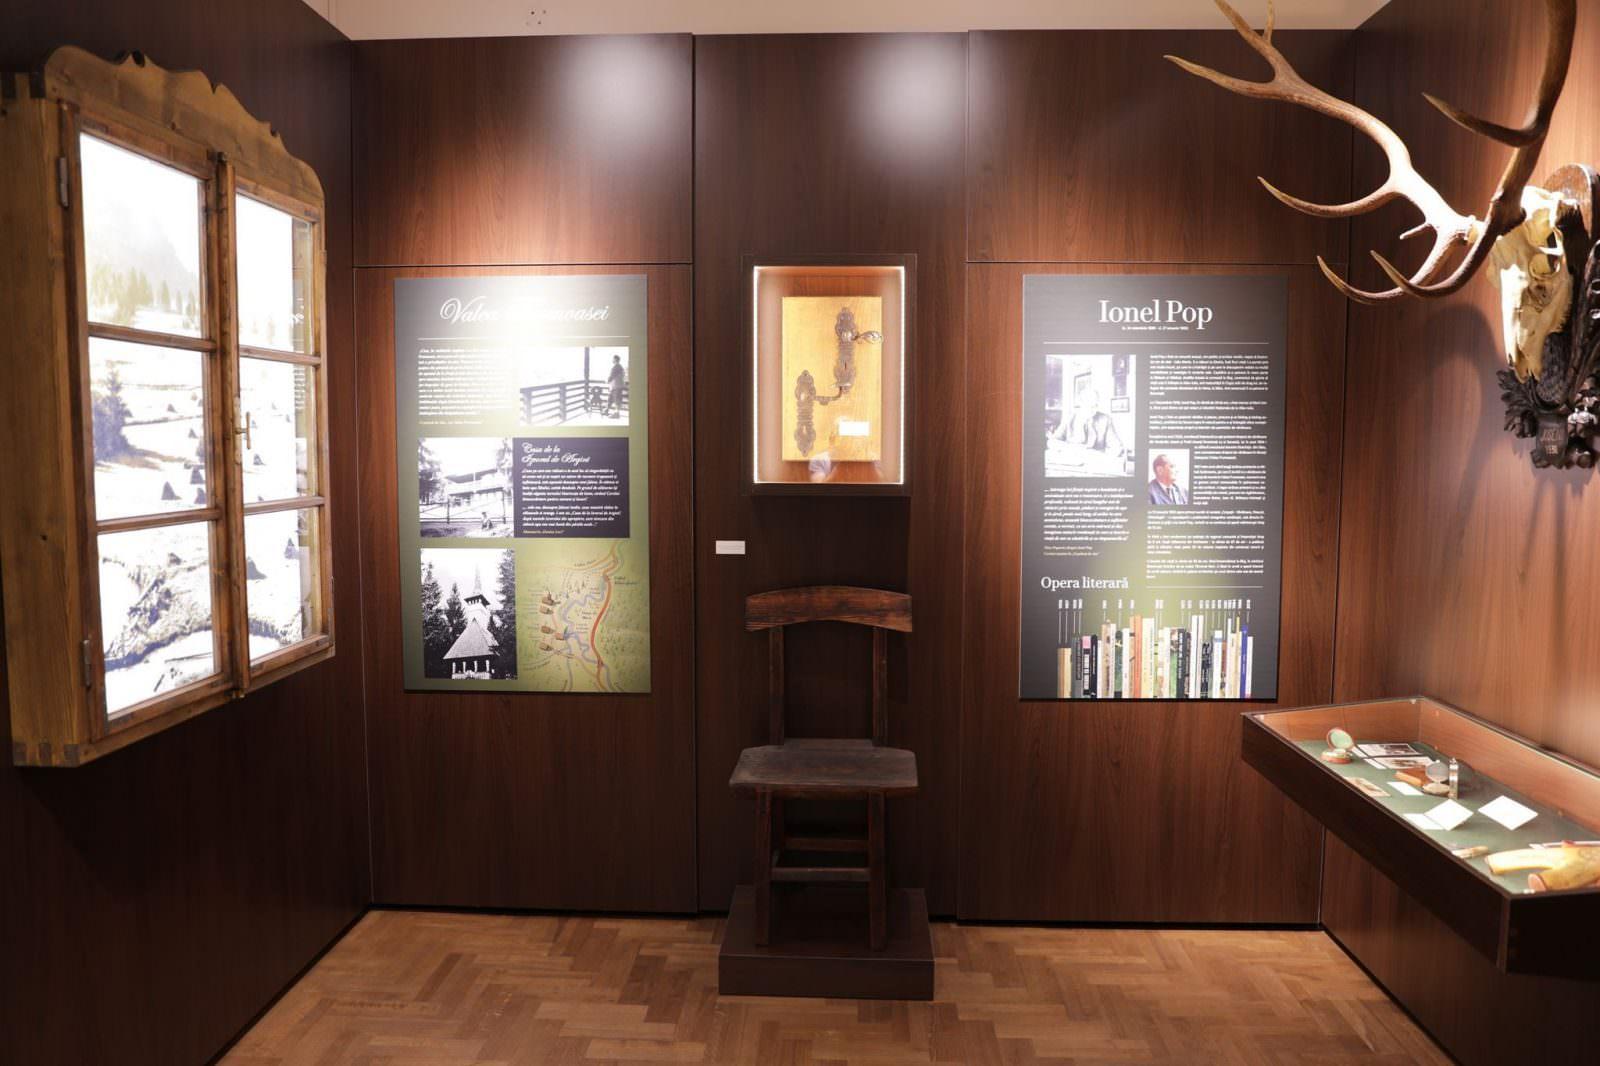 muzeul cinegetic expozitie 5